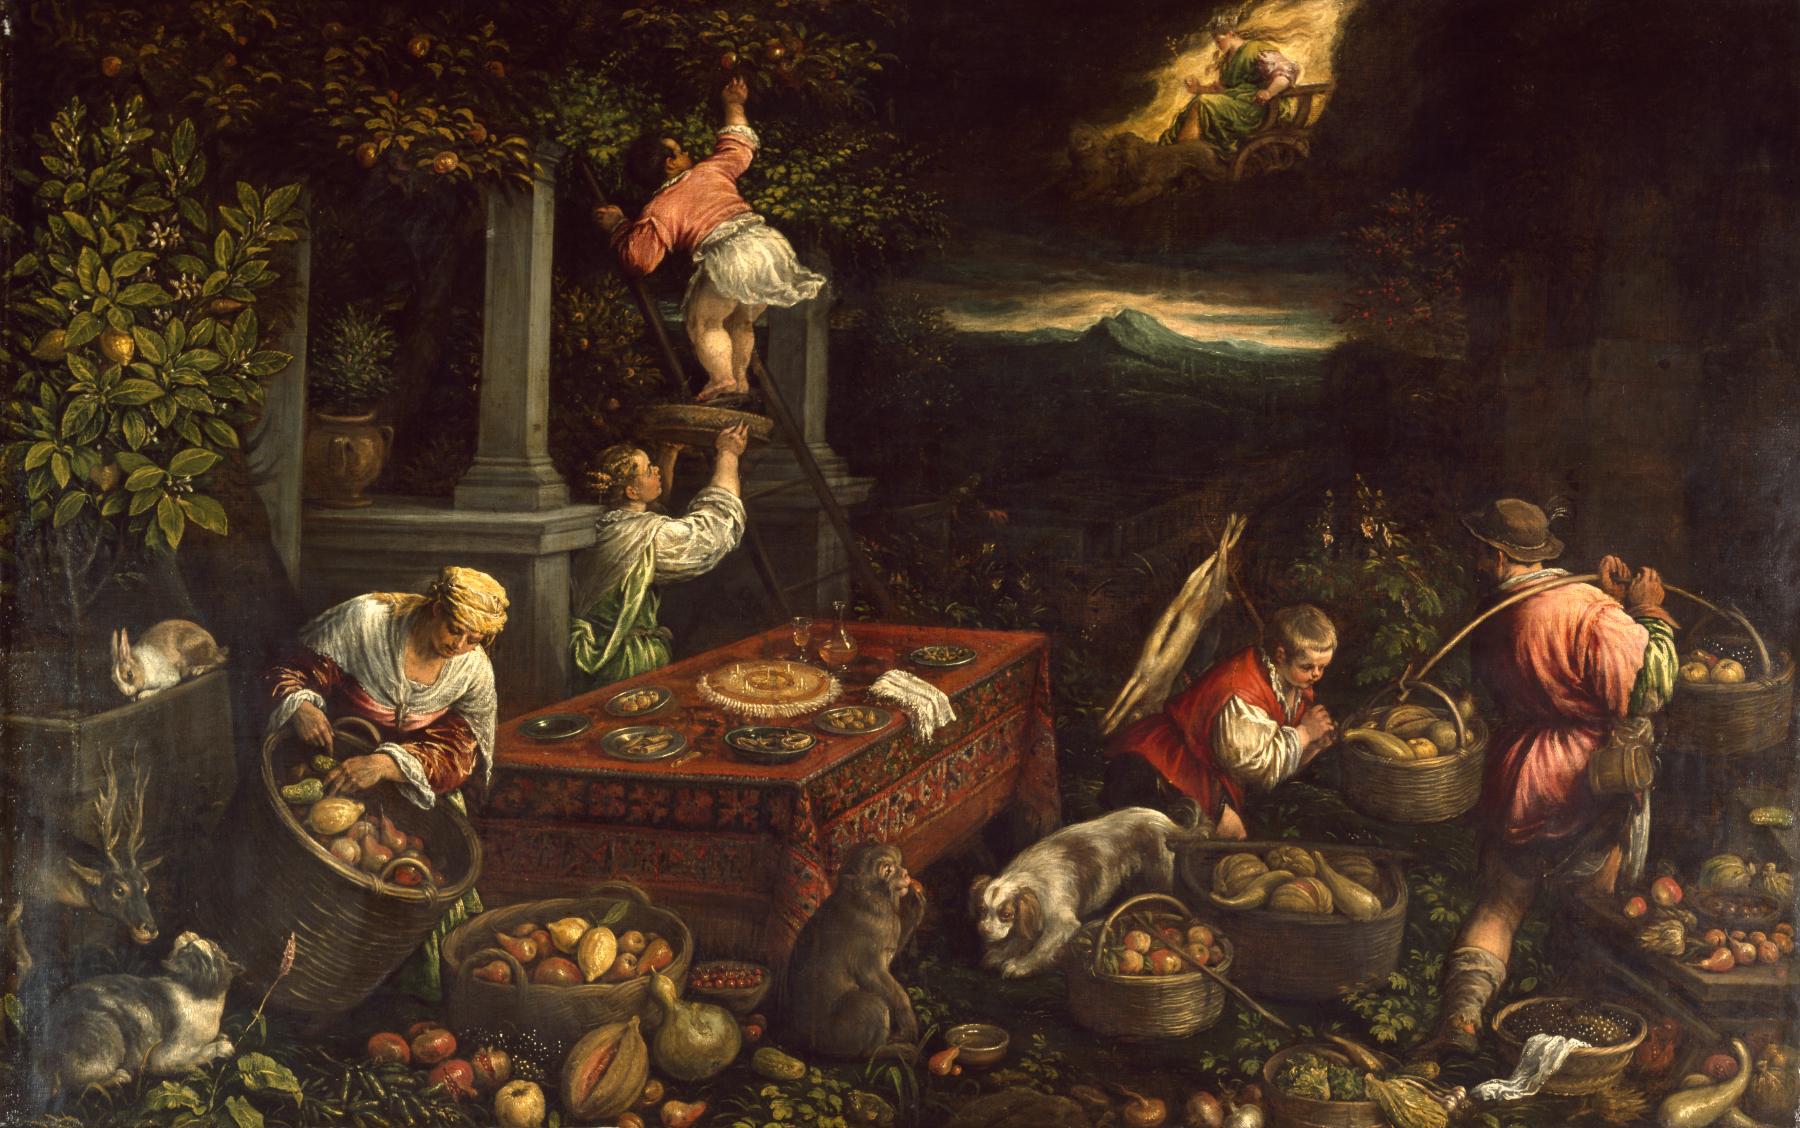 Alchemist allegory